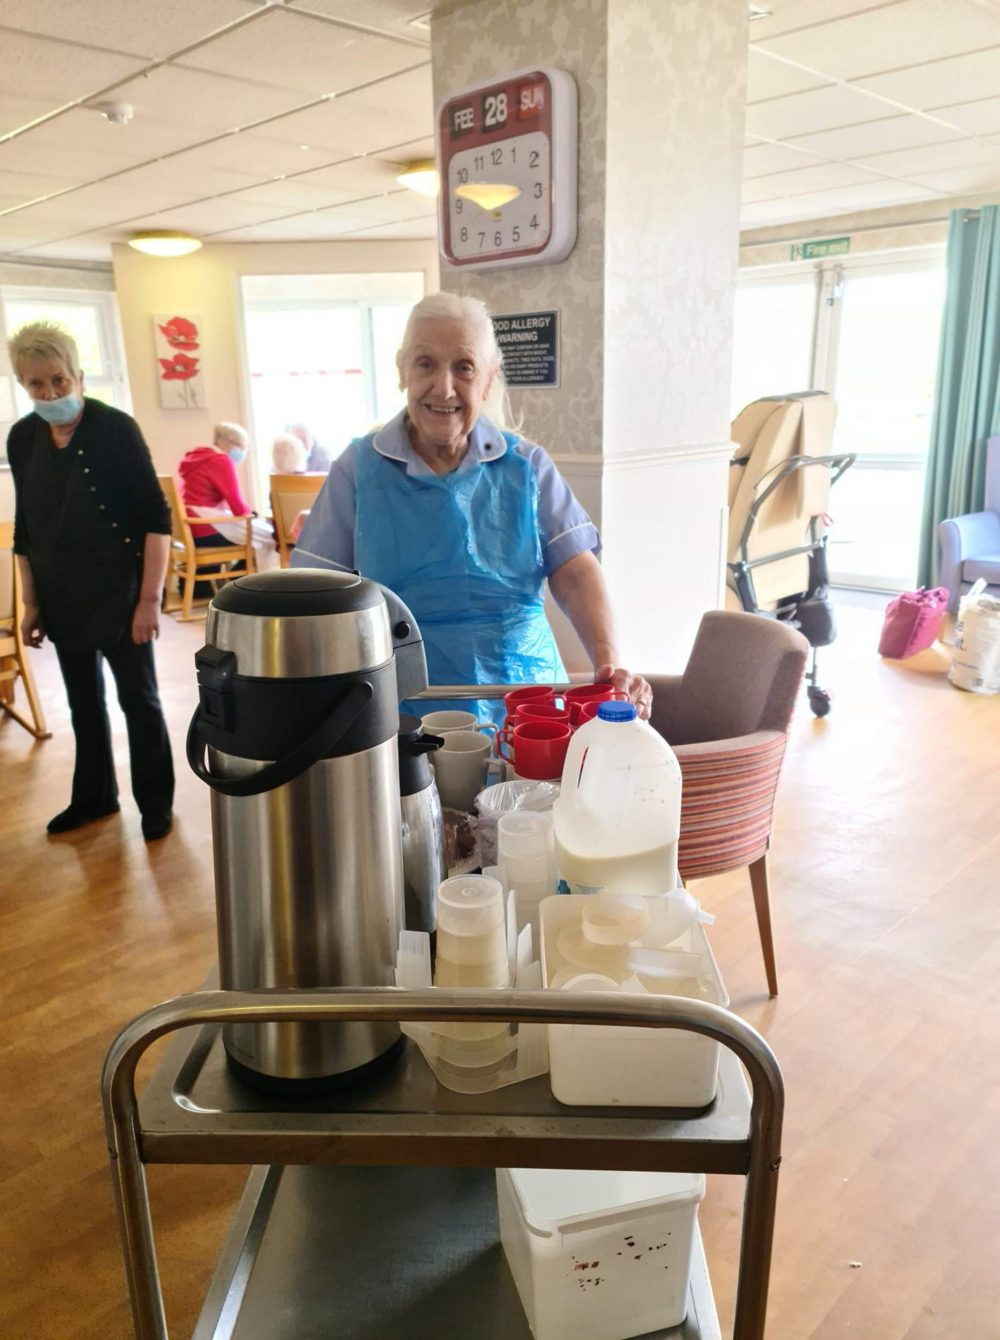 84 year old care volunteer | UK News